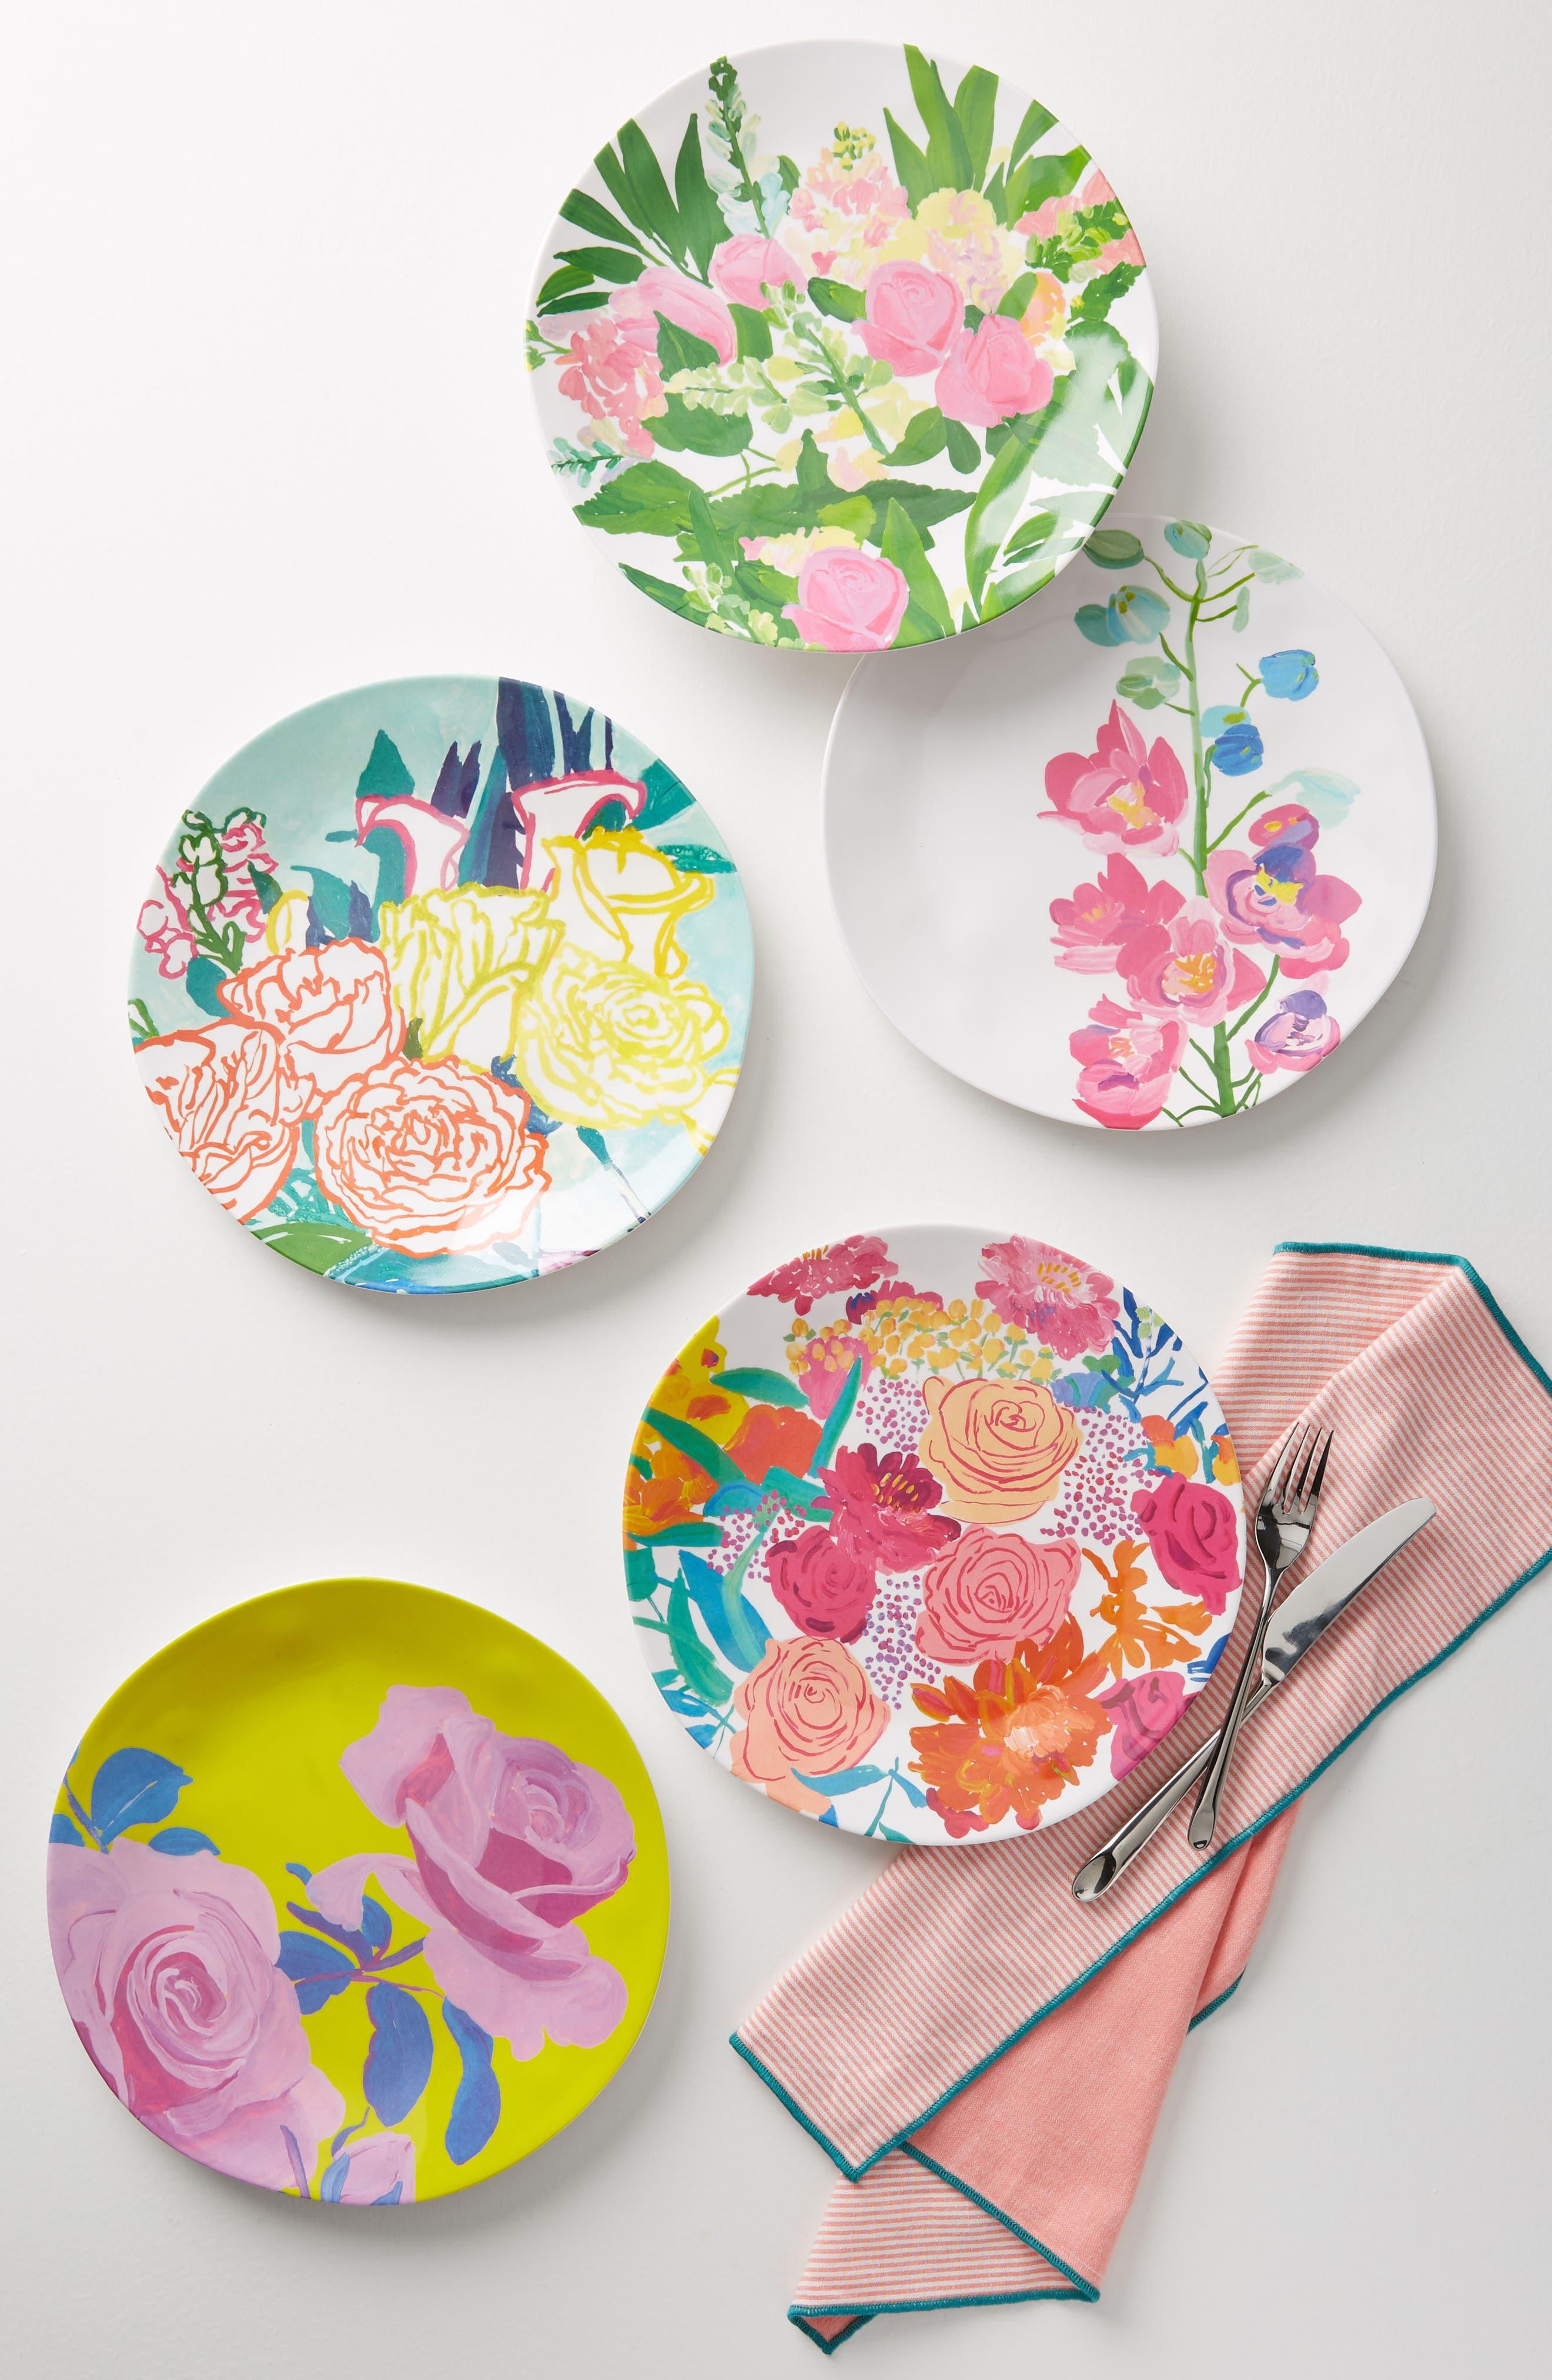 PINK ...  sc 1 st  Nordstrom & Pink Dinnerware: Dishes Plates \u0026 Bowls | Nordstrom